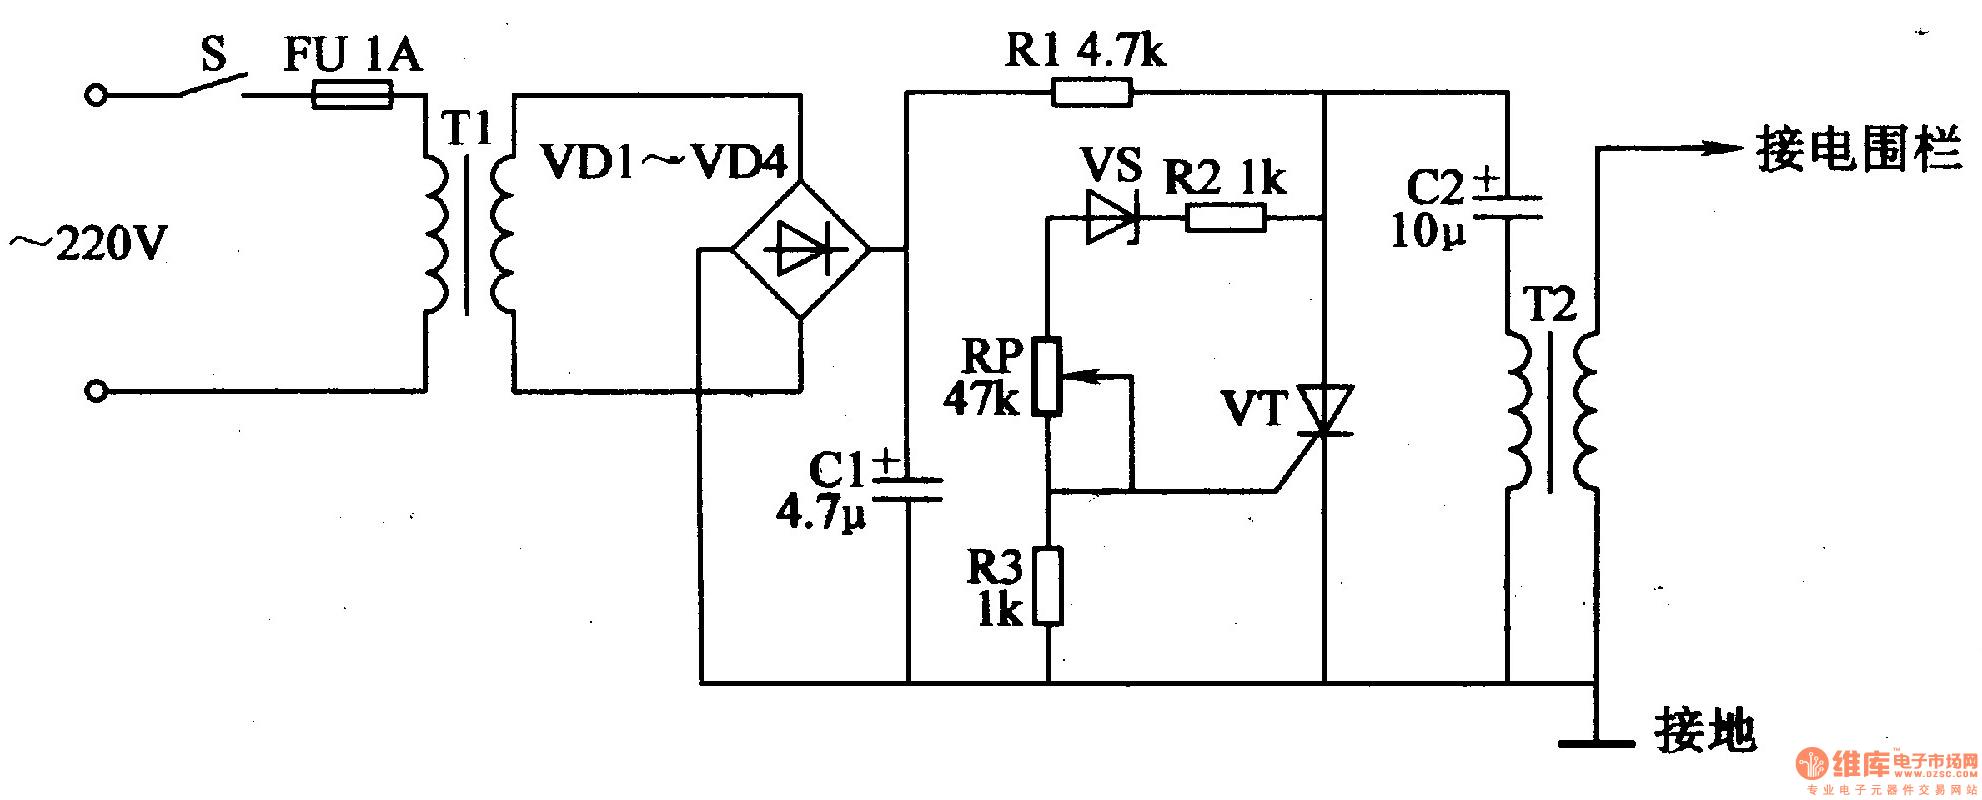 Com 7103 555 Tlc555 Relay Driver Circuit Relay Driver Schematic